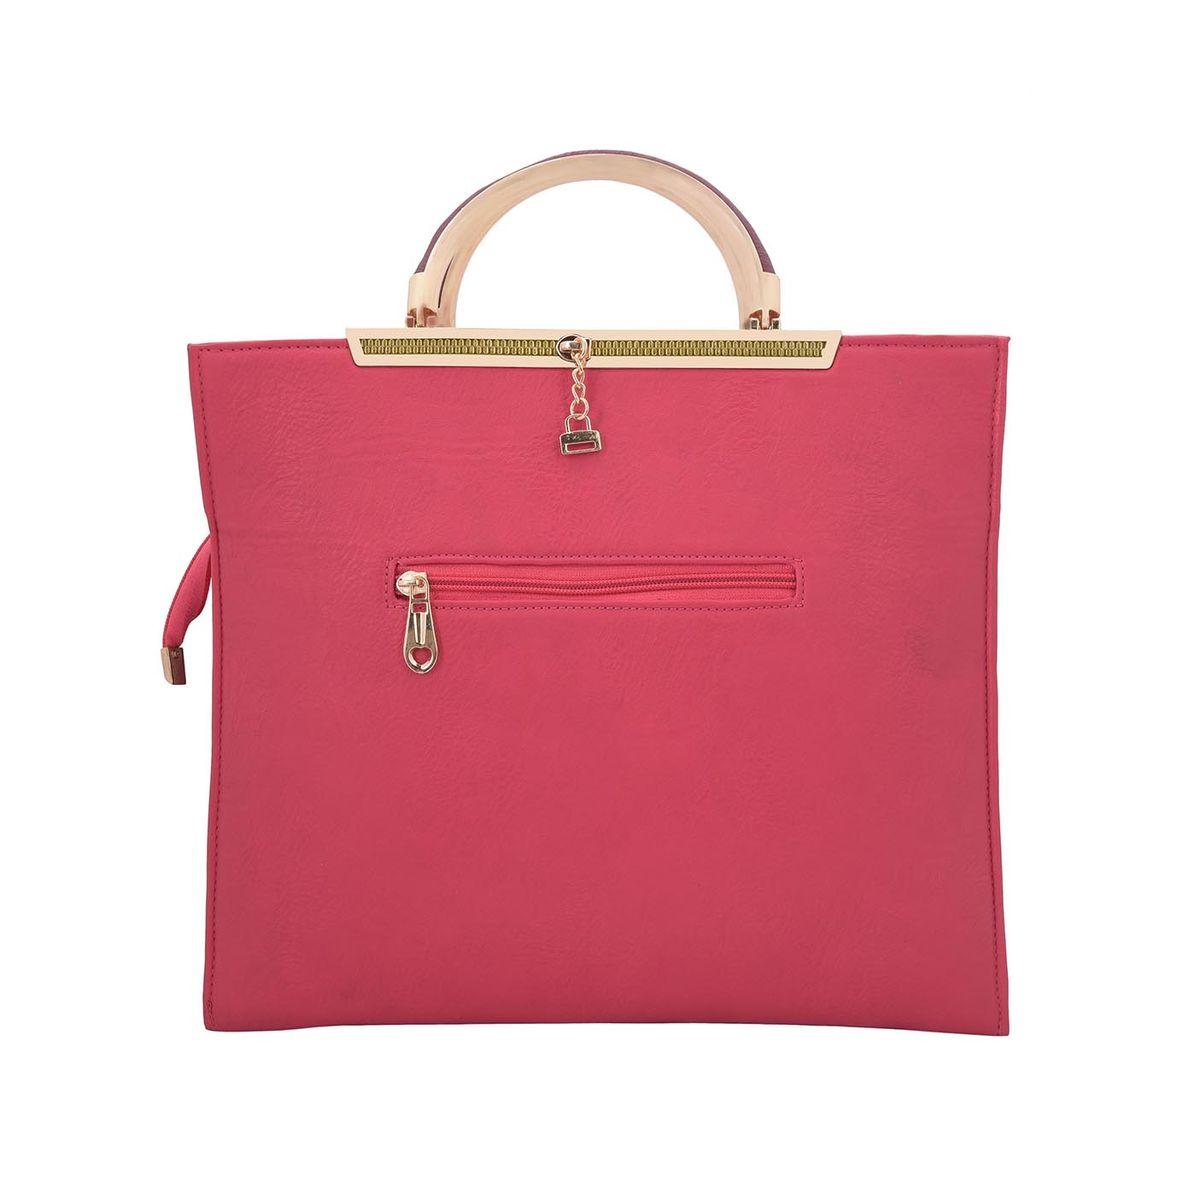 The Blue Pink Ashley Red Women Handbag ASH-03